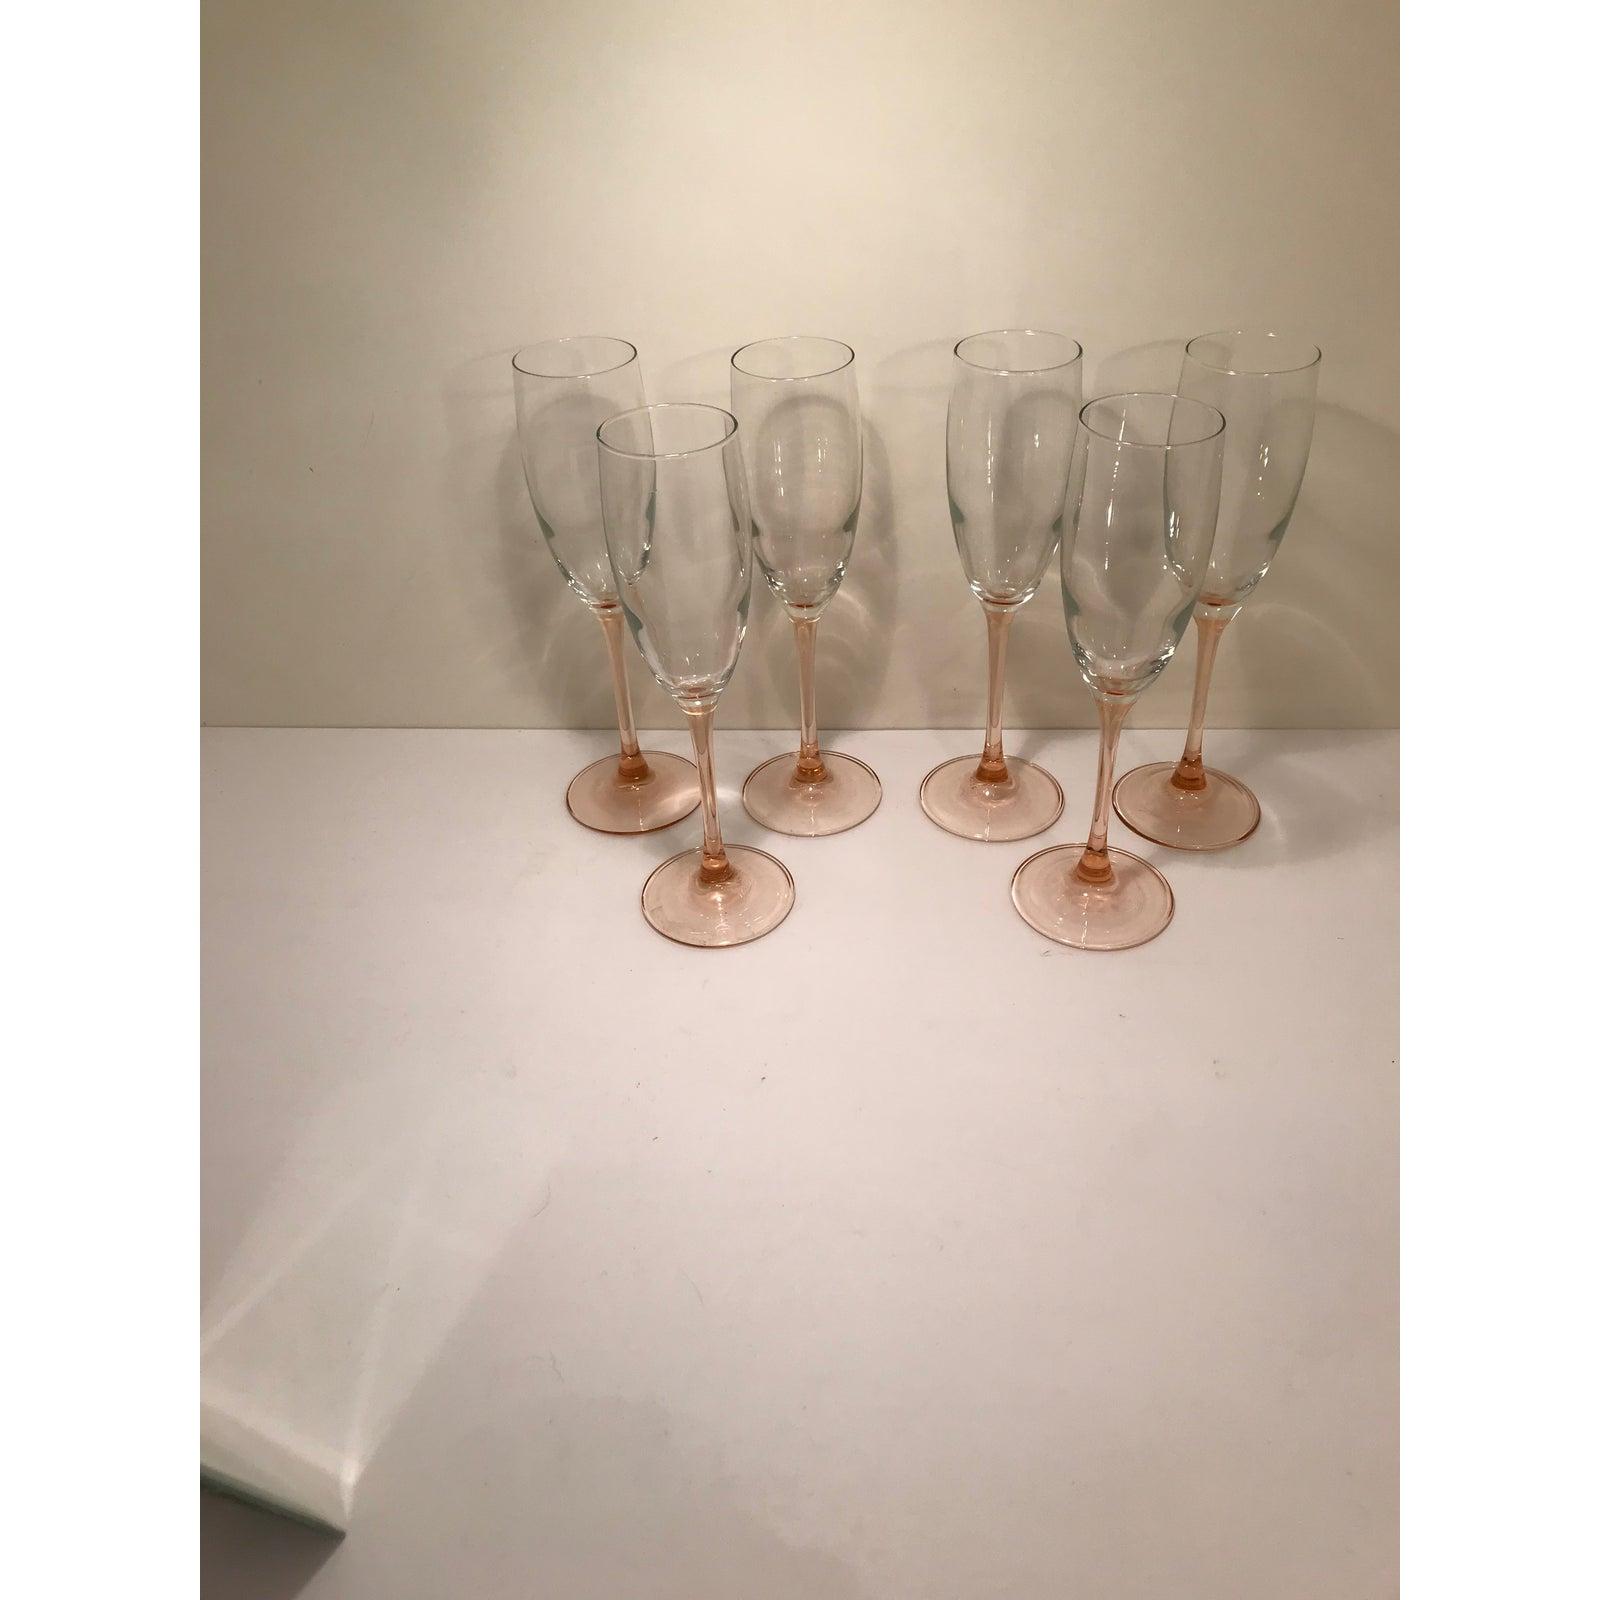 olga cassini long stem champagne flutes - HD1600×1600